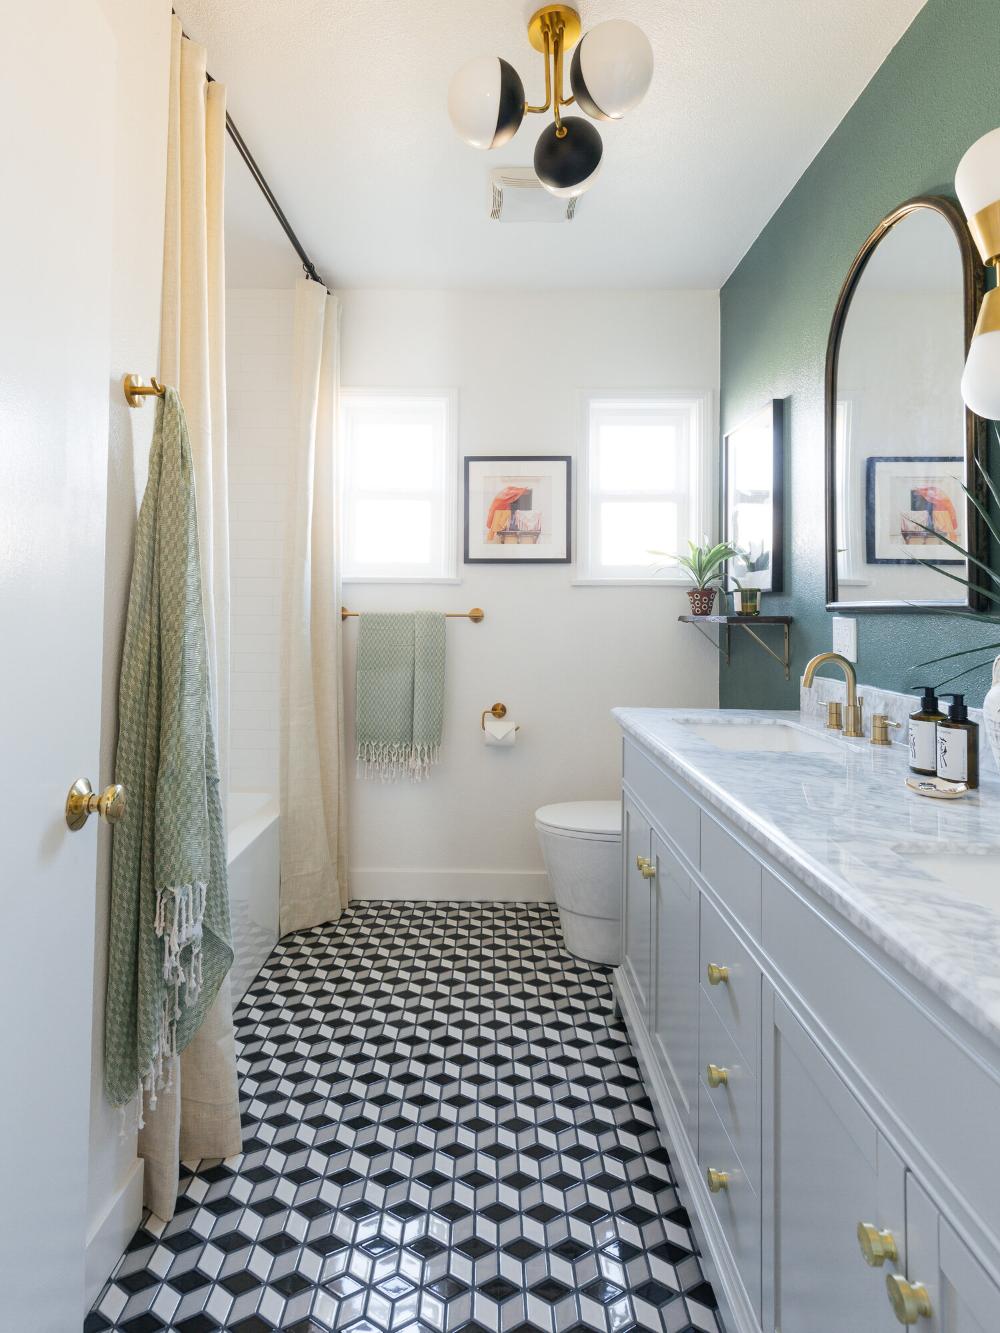 Ad Bold Prism Porcelain Mosaic Tiles From Flooranddecor Stylish Bathroom Bathrooms Remodel Art Deco Bathroom